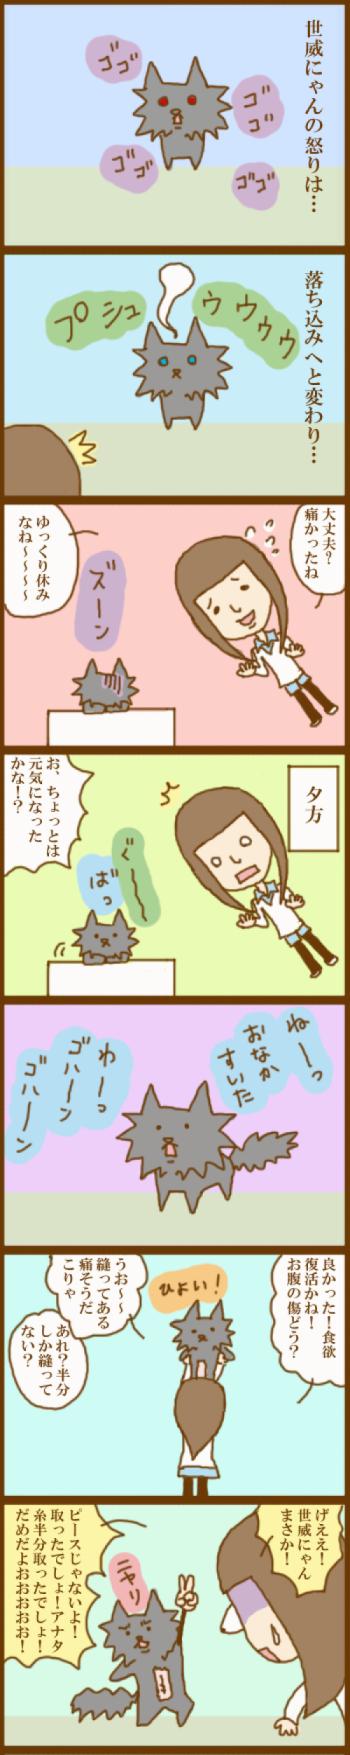 f:id:suzuokayu:20201115190249j:plain